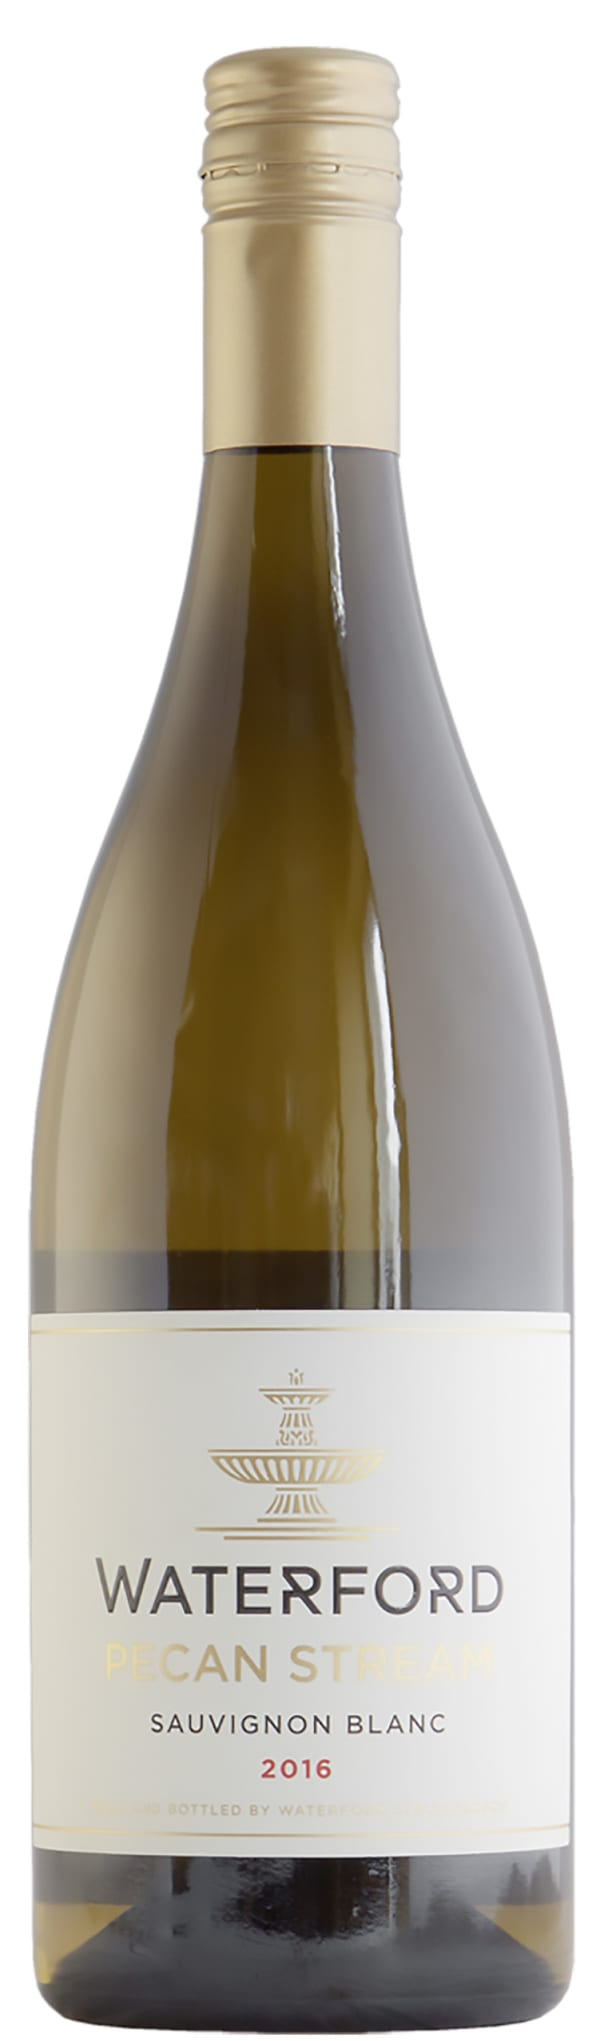 Waterford Pecan Stream Sauvignon Blanc 2016